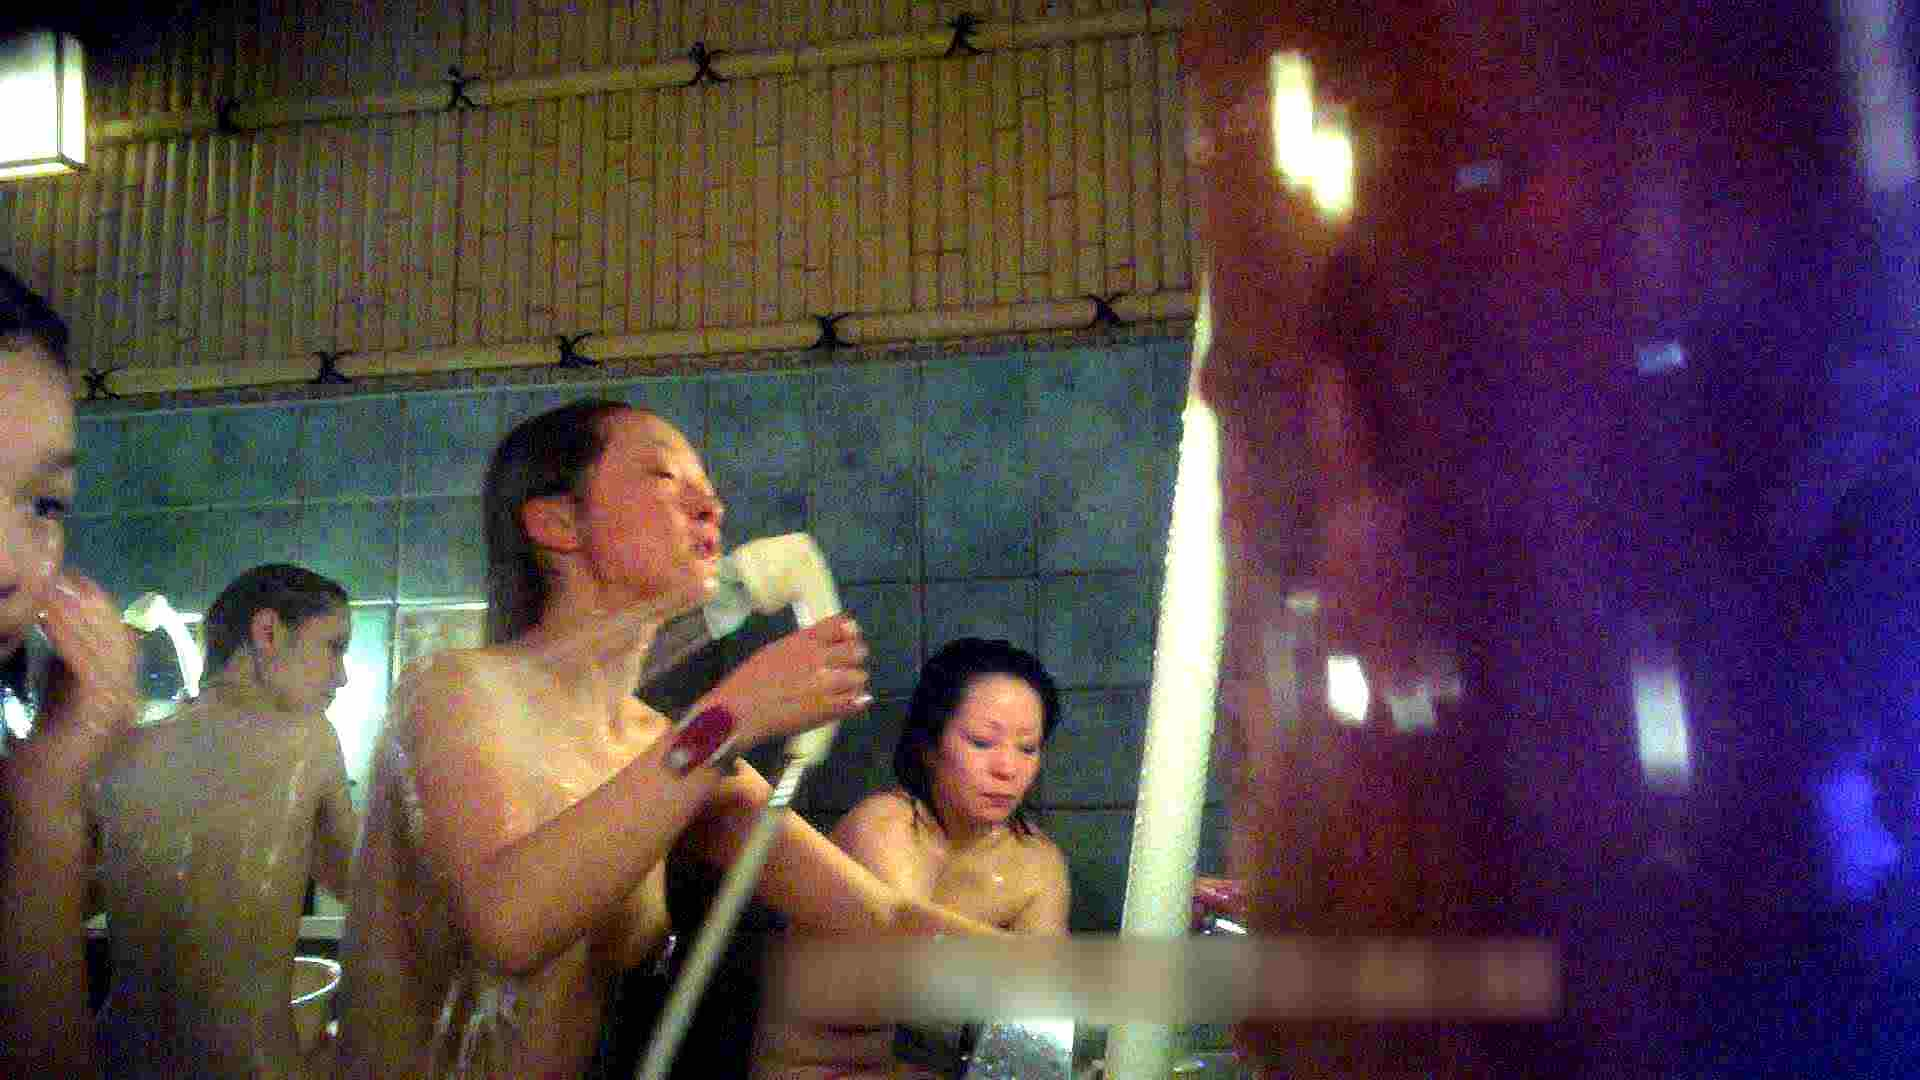 TG.12 【上等兵】いやぁ若い!ぷっちぷちギャル!でも時間短い・・・ 潜入   女風呂  67pic 55